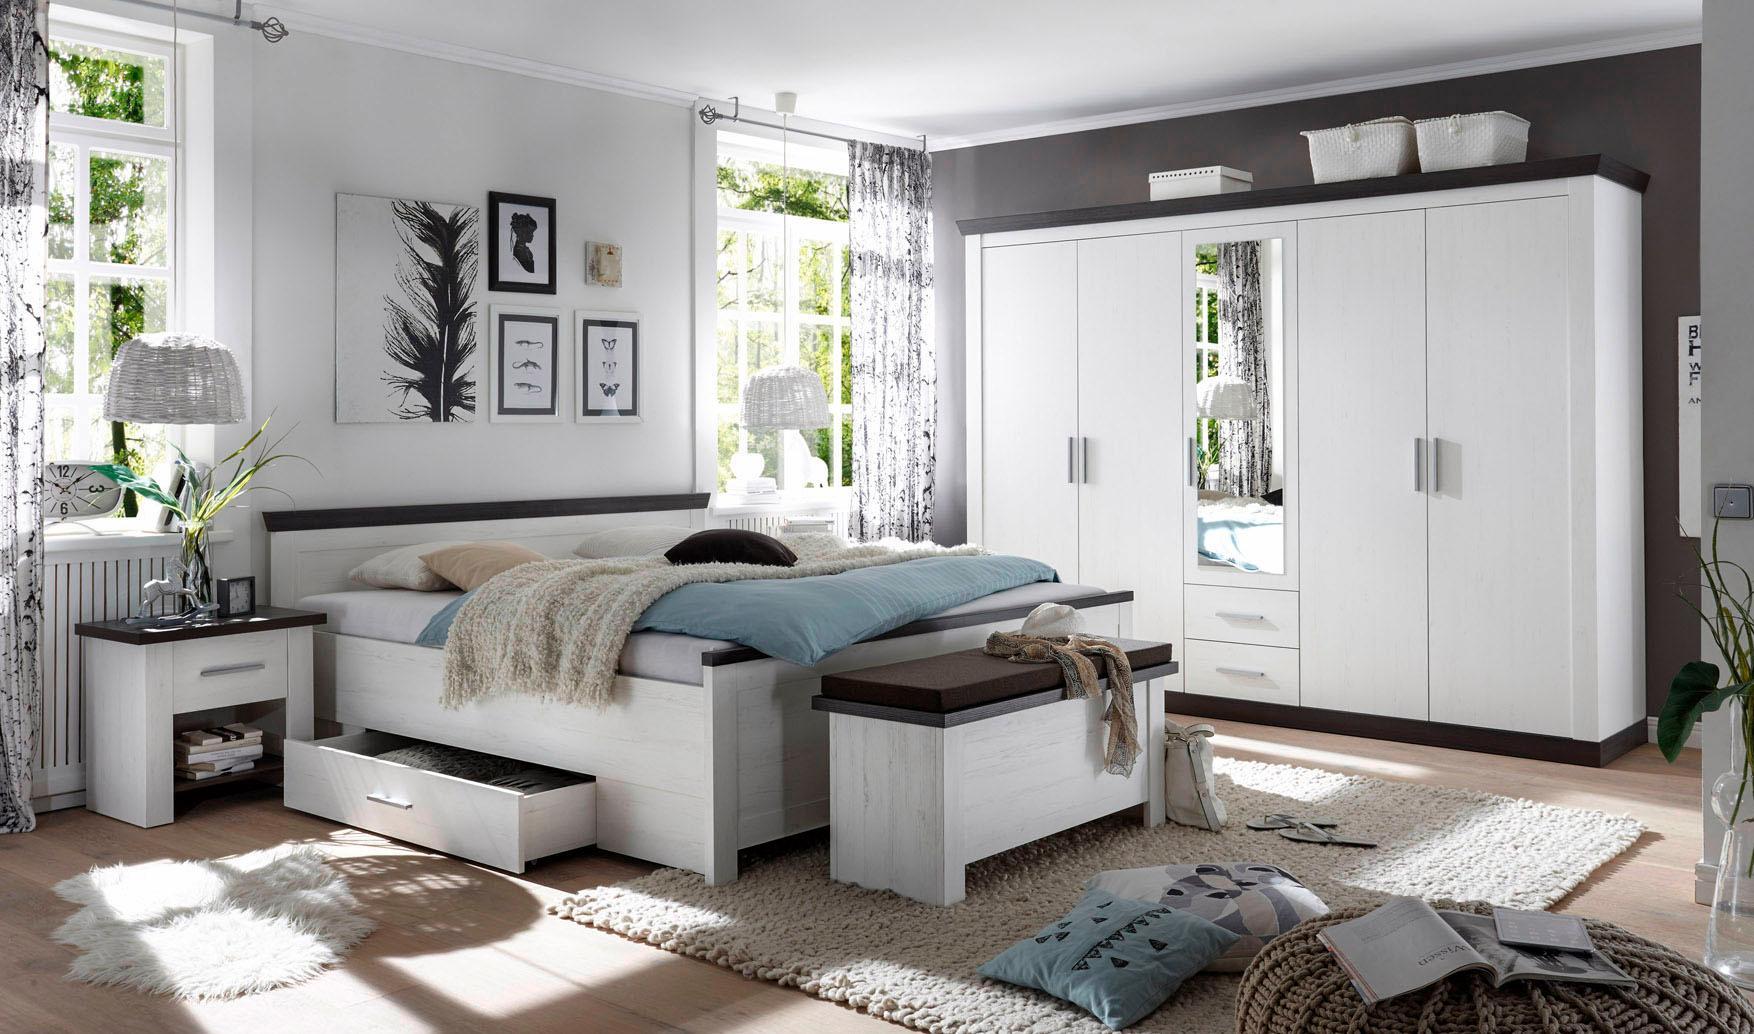 Home affaire Schlafzimmer-Set Siena (Set 4-tlg)